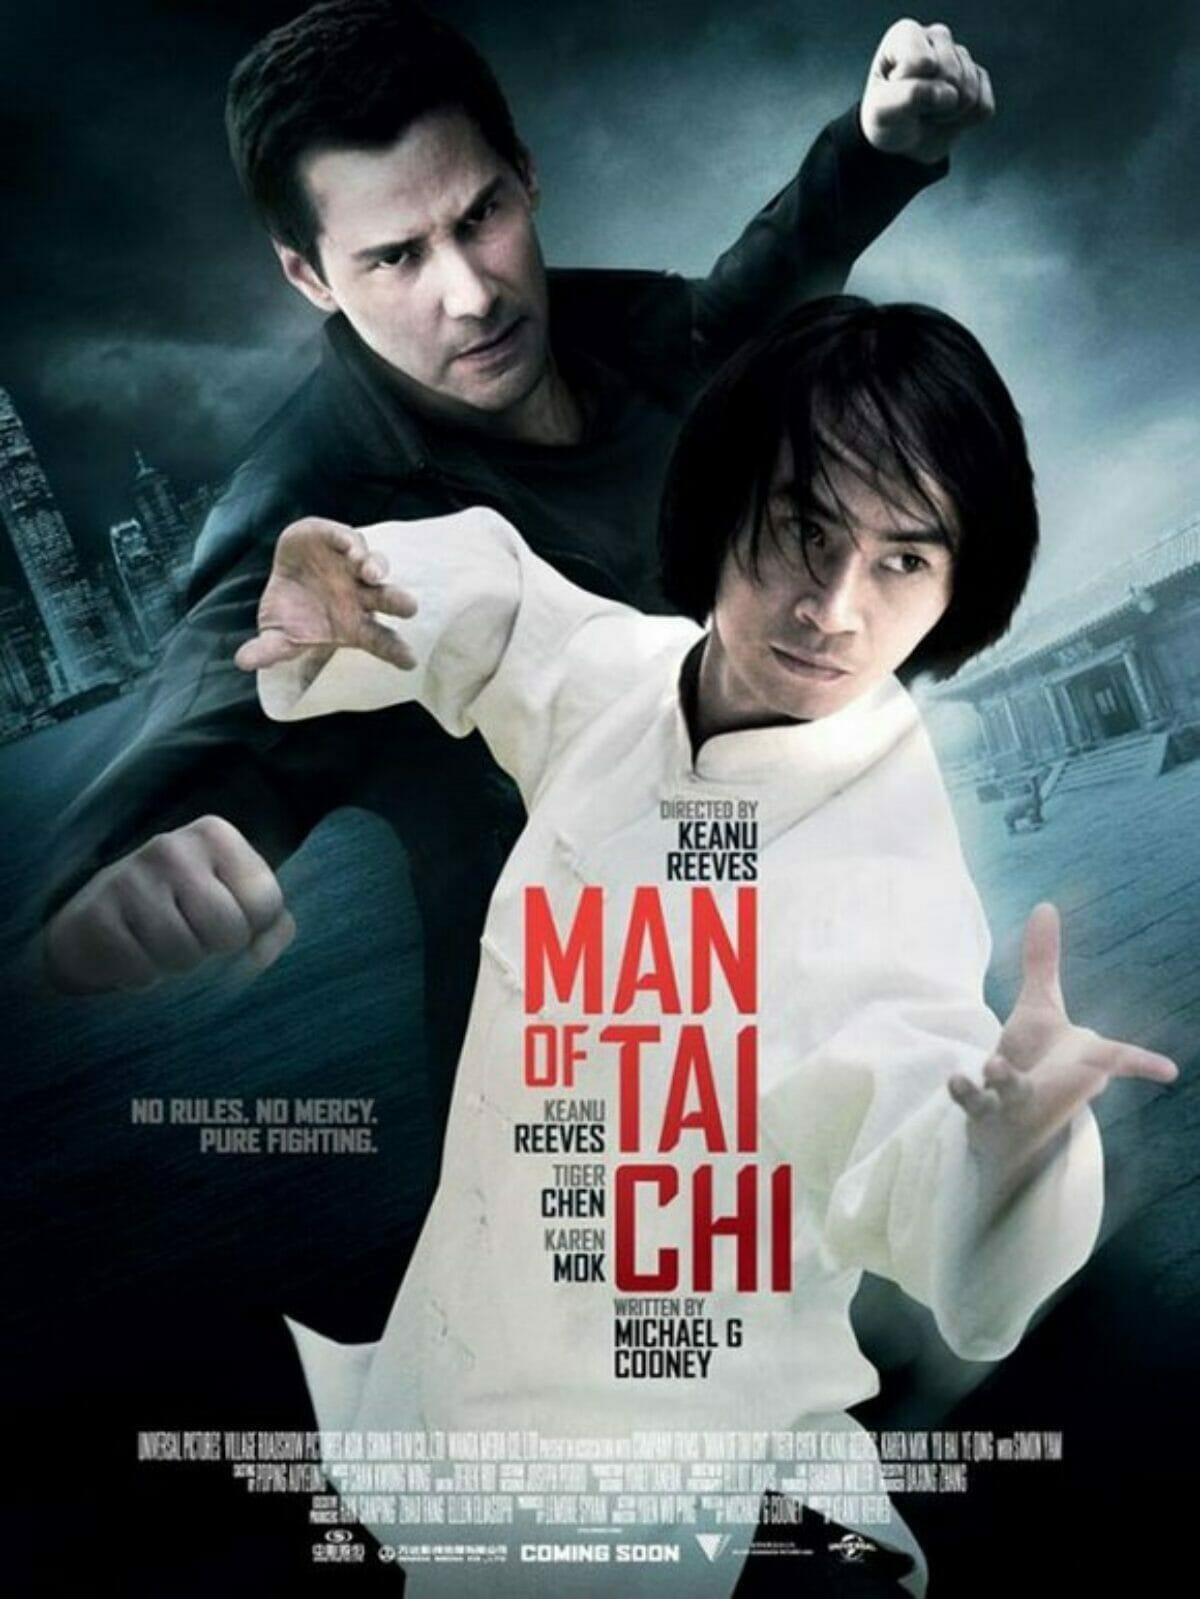 Man-of-Tai-chi-affiche